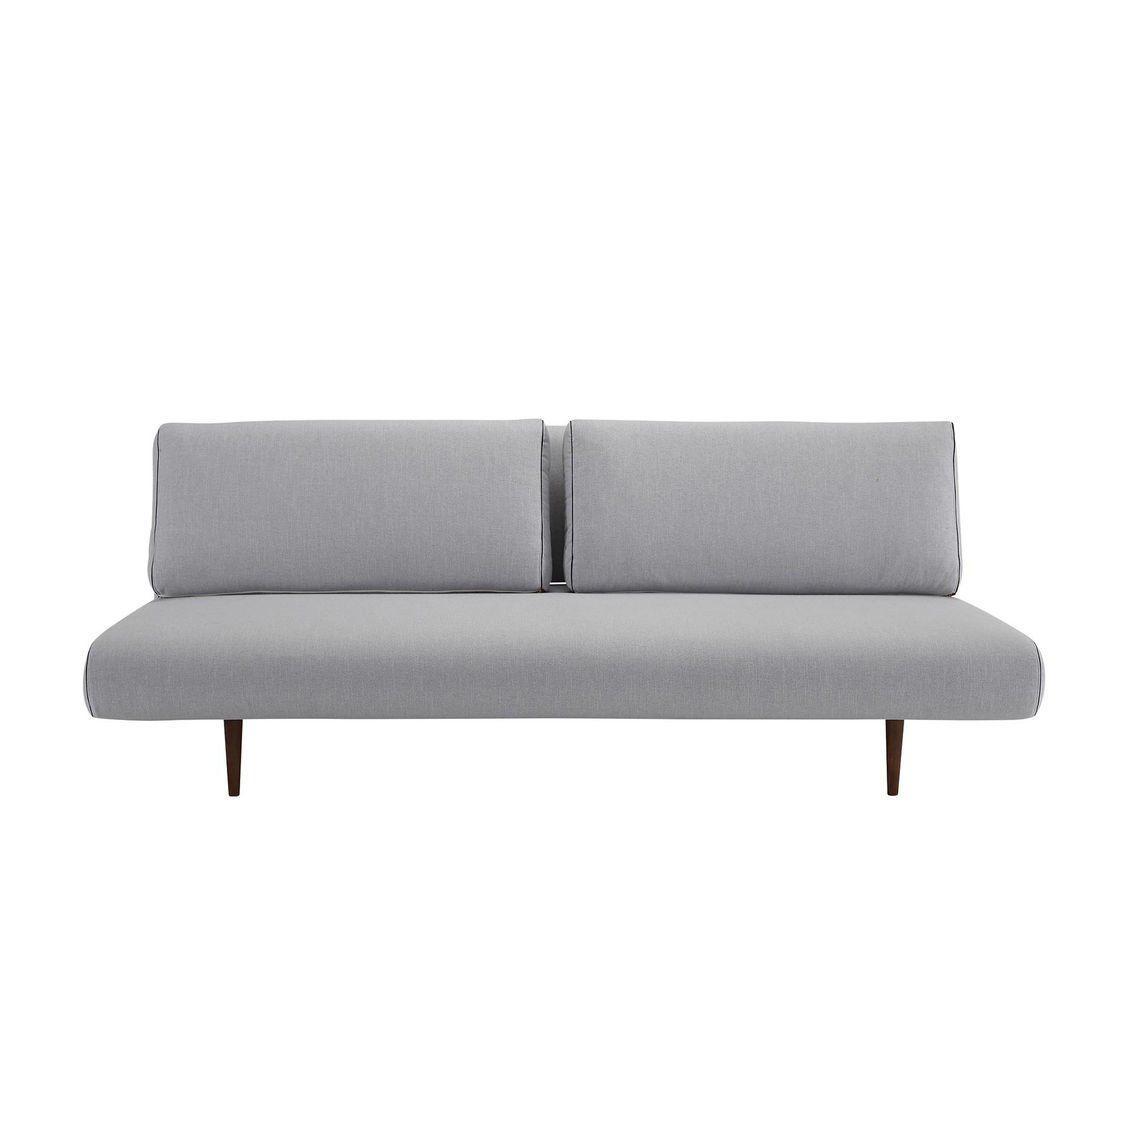 Unfurl Lounger Sofa Bed